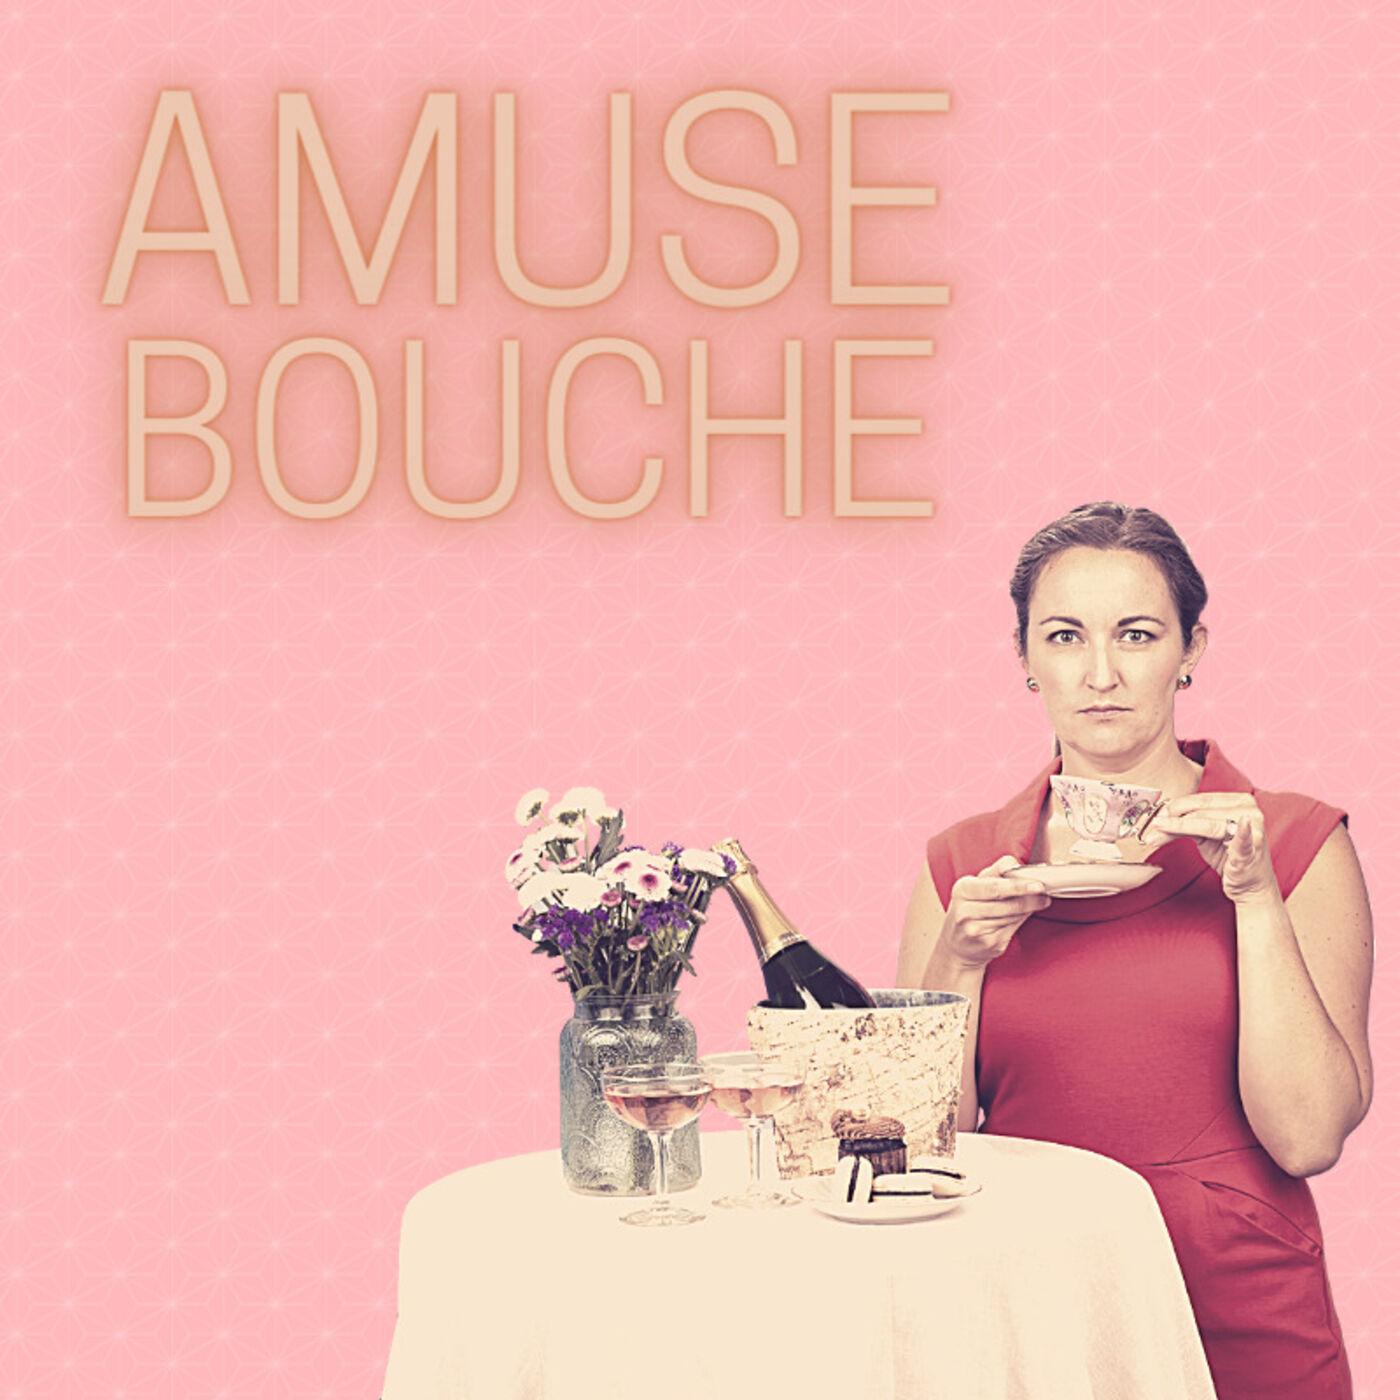 The Running Community - Amuse Bouche #3